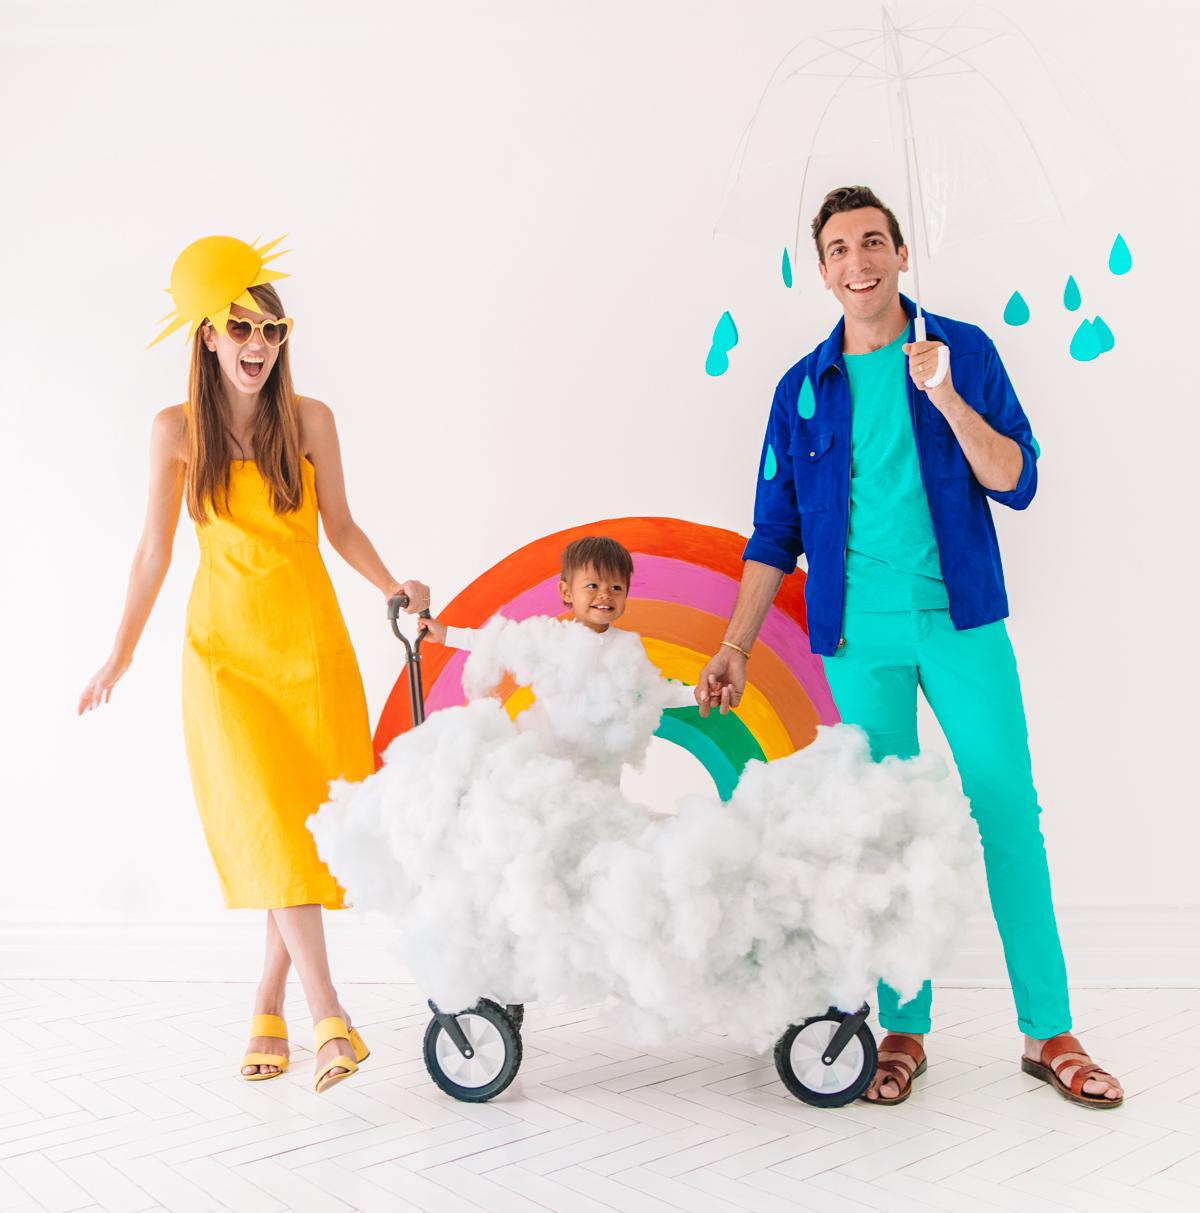 10 Funny \u0026 Creative Family Halloween Costume Ideas for Kids